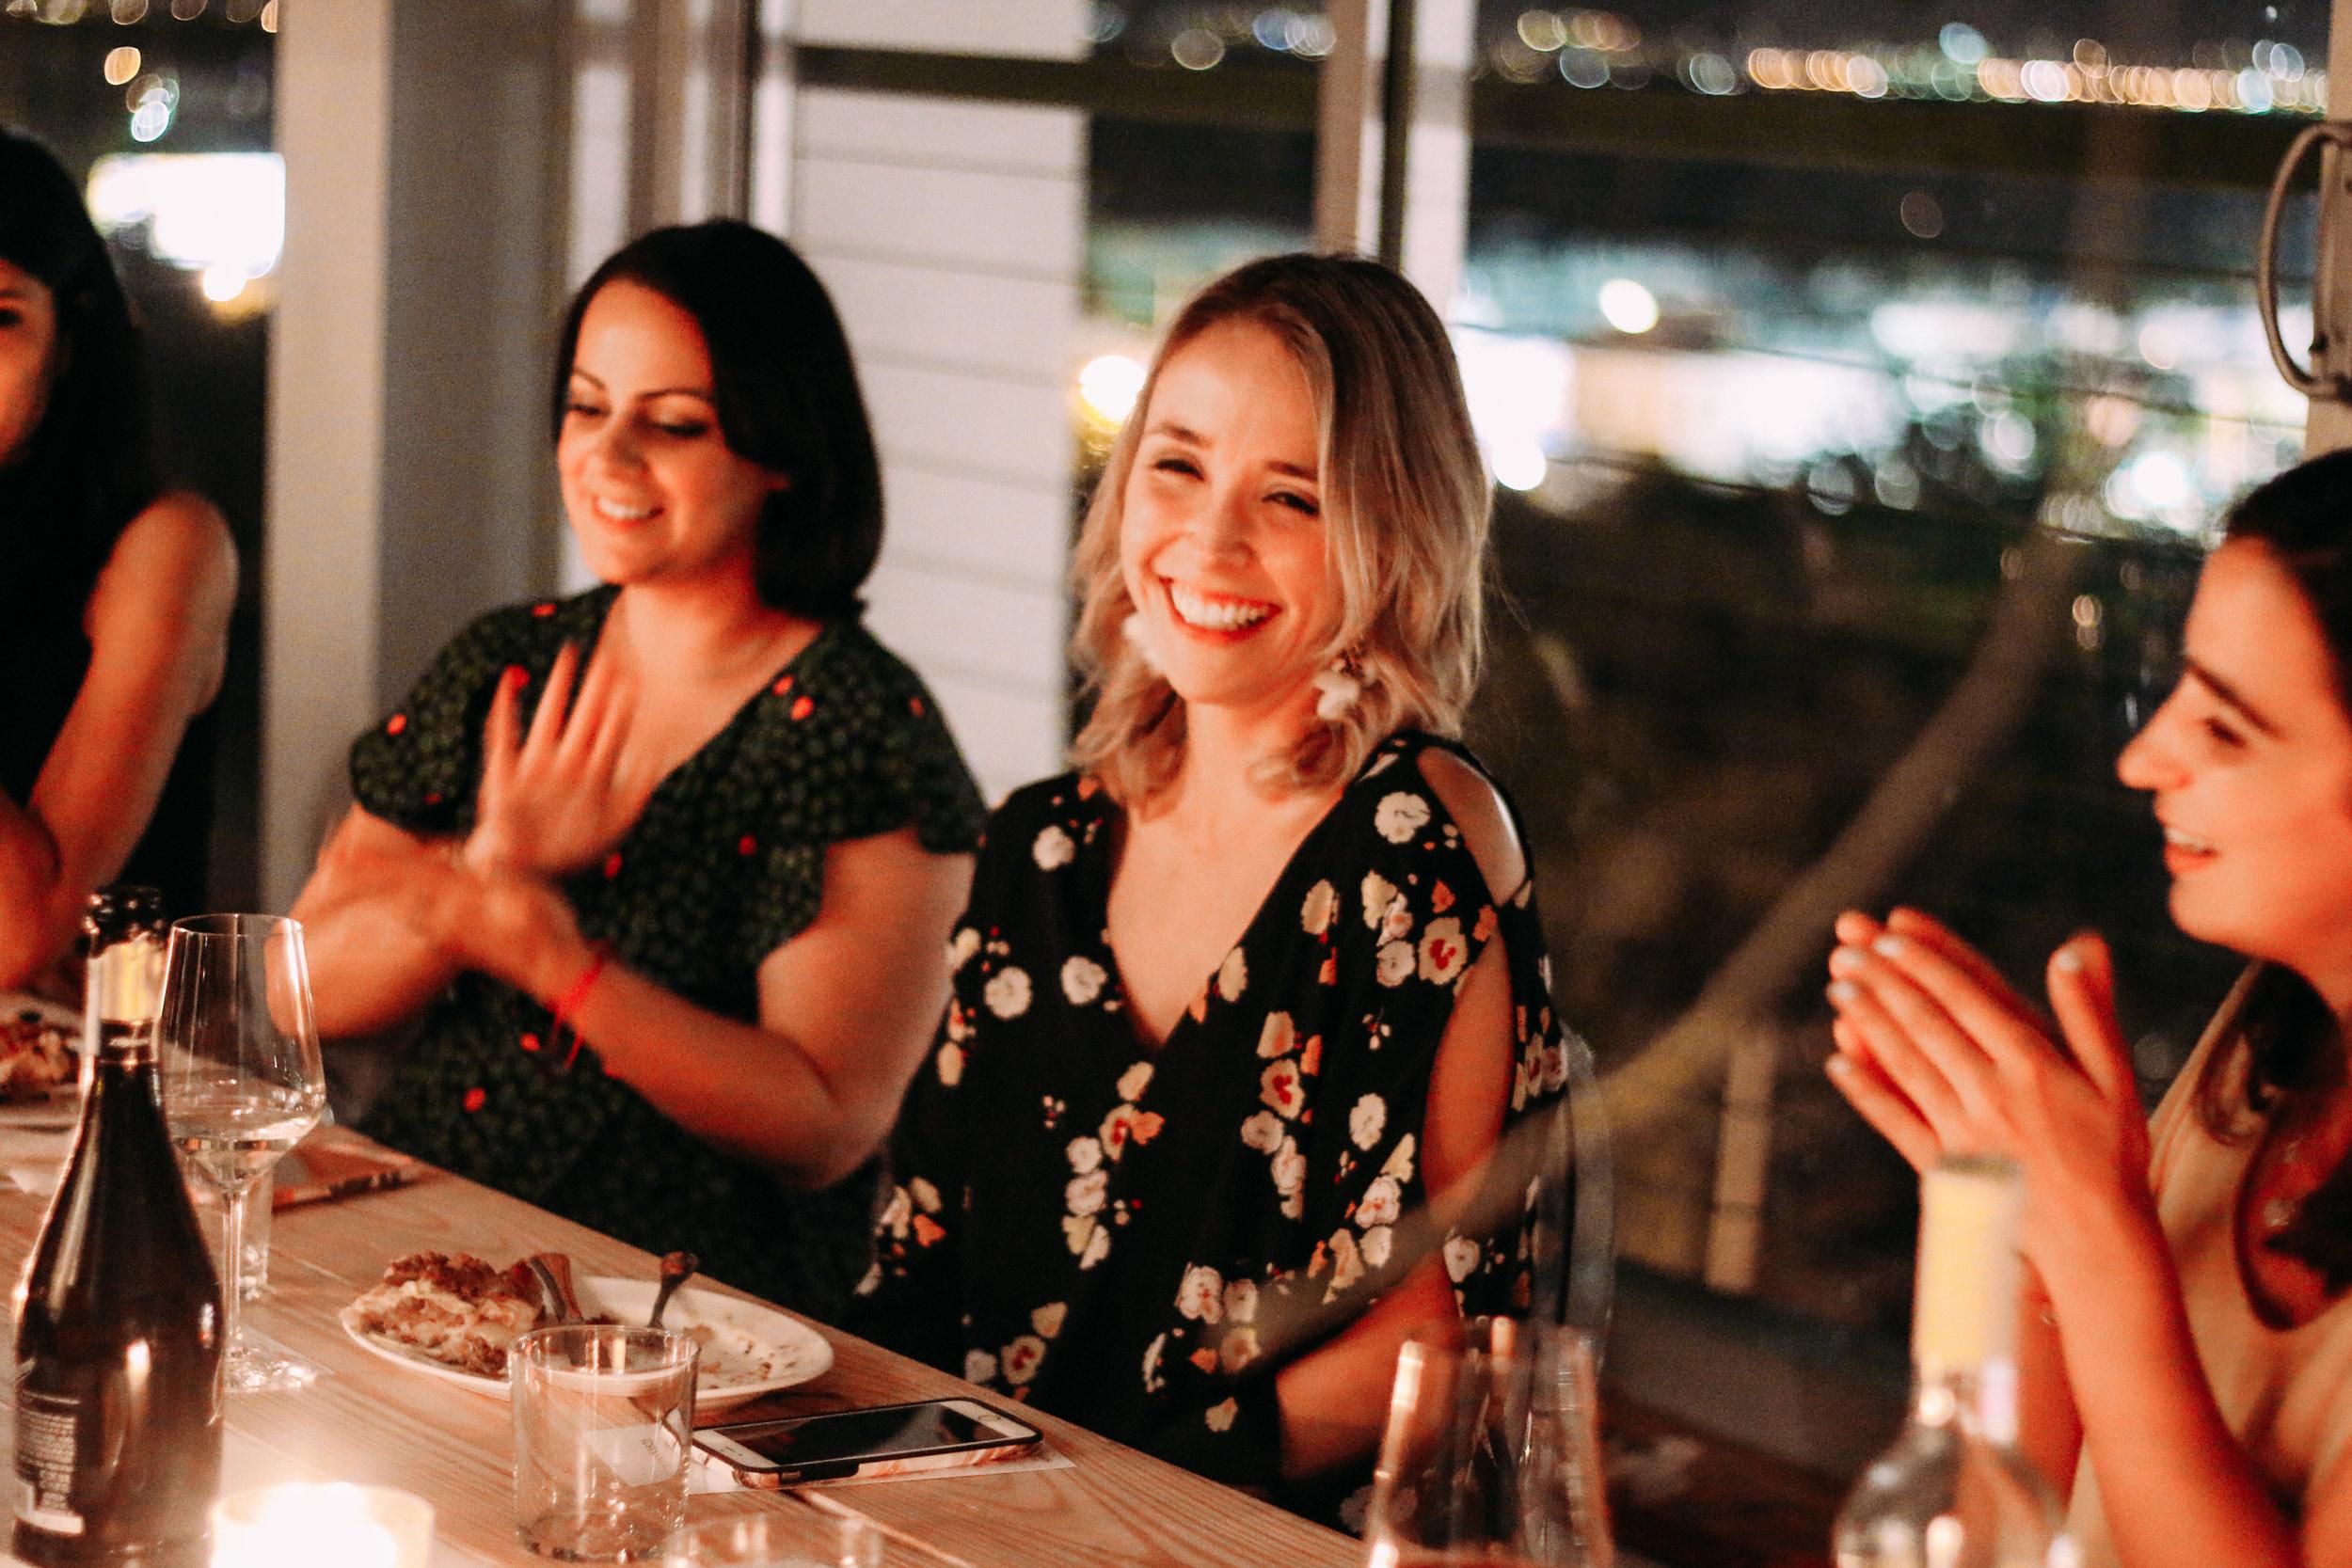 Women Who Wine Uncorked Conversations-Miami Wine Events-Wine Tasting Miami-71.jpg